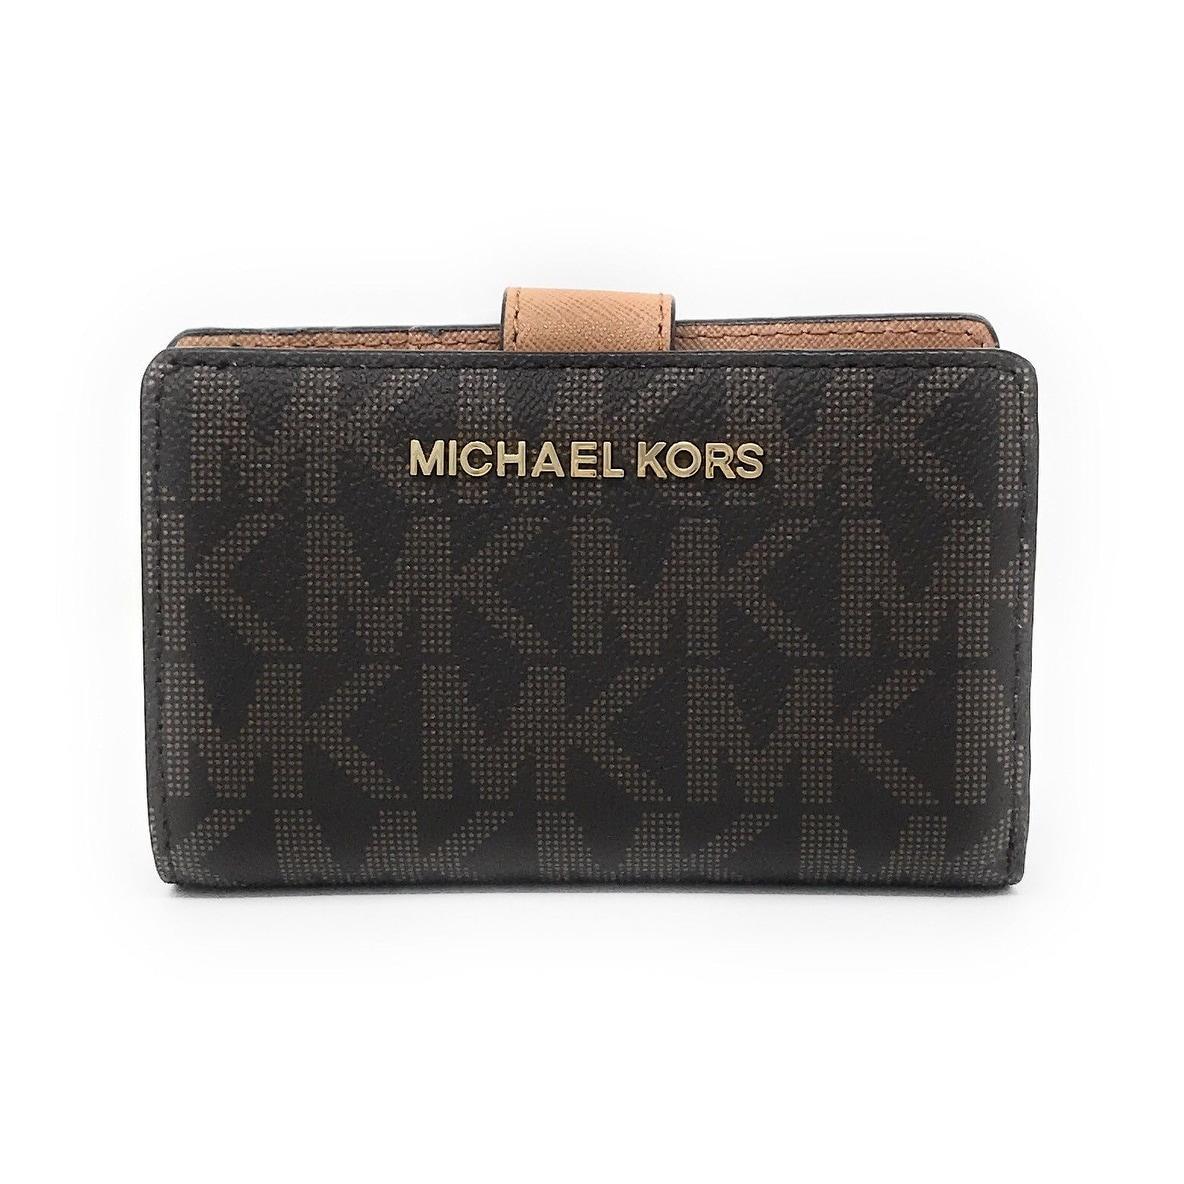 099e1deb4820 Shop Michael Kors Jet Set Travel Bifold Zip Coin Wallet - Brown ...